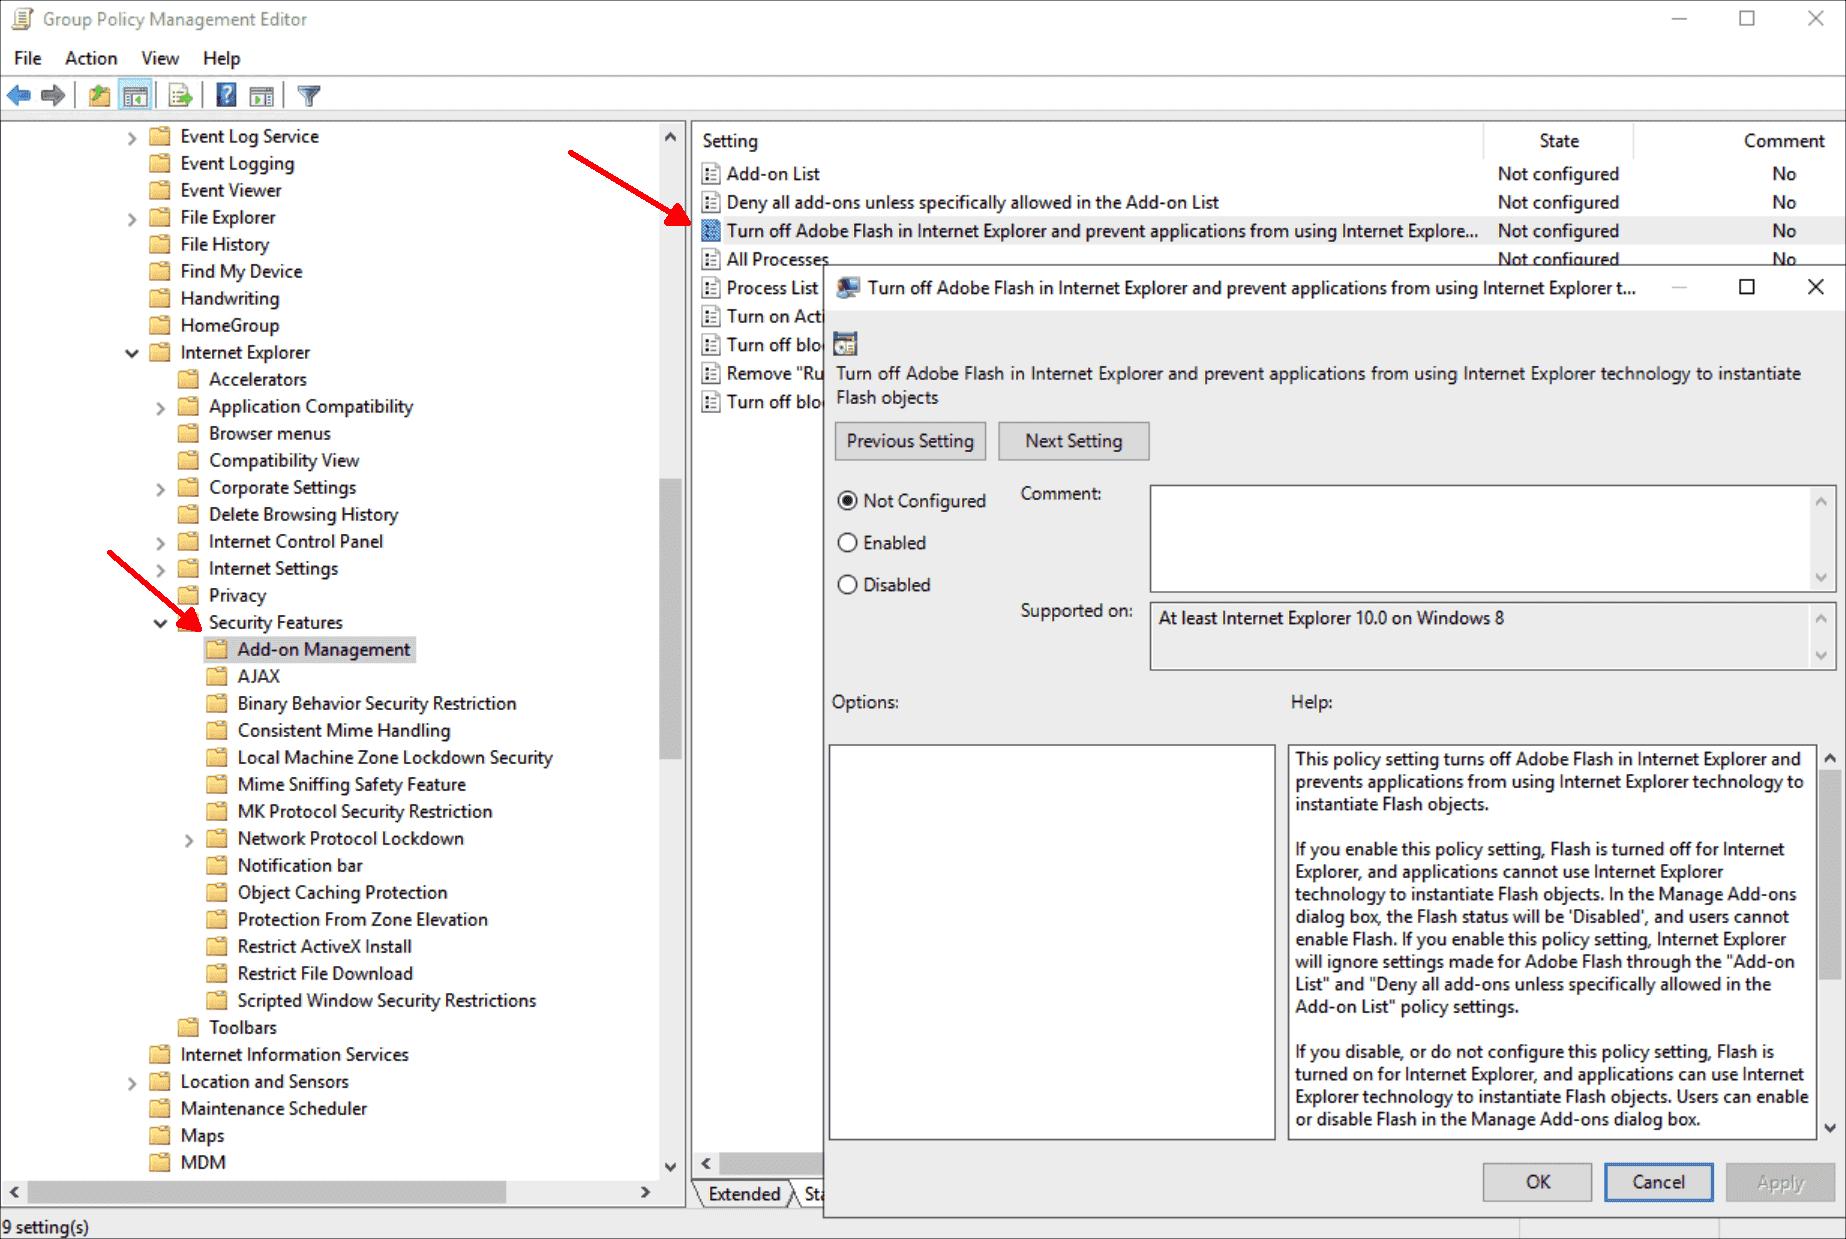 Blocking Adobe Flash in Internet Explorer